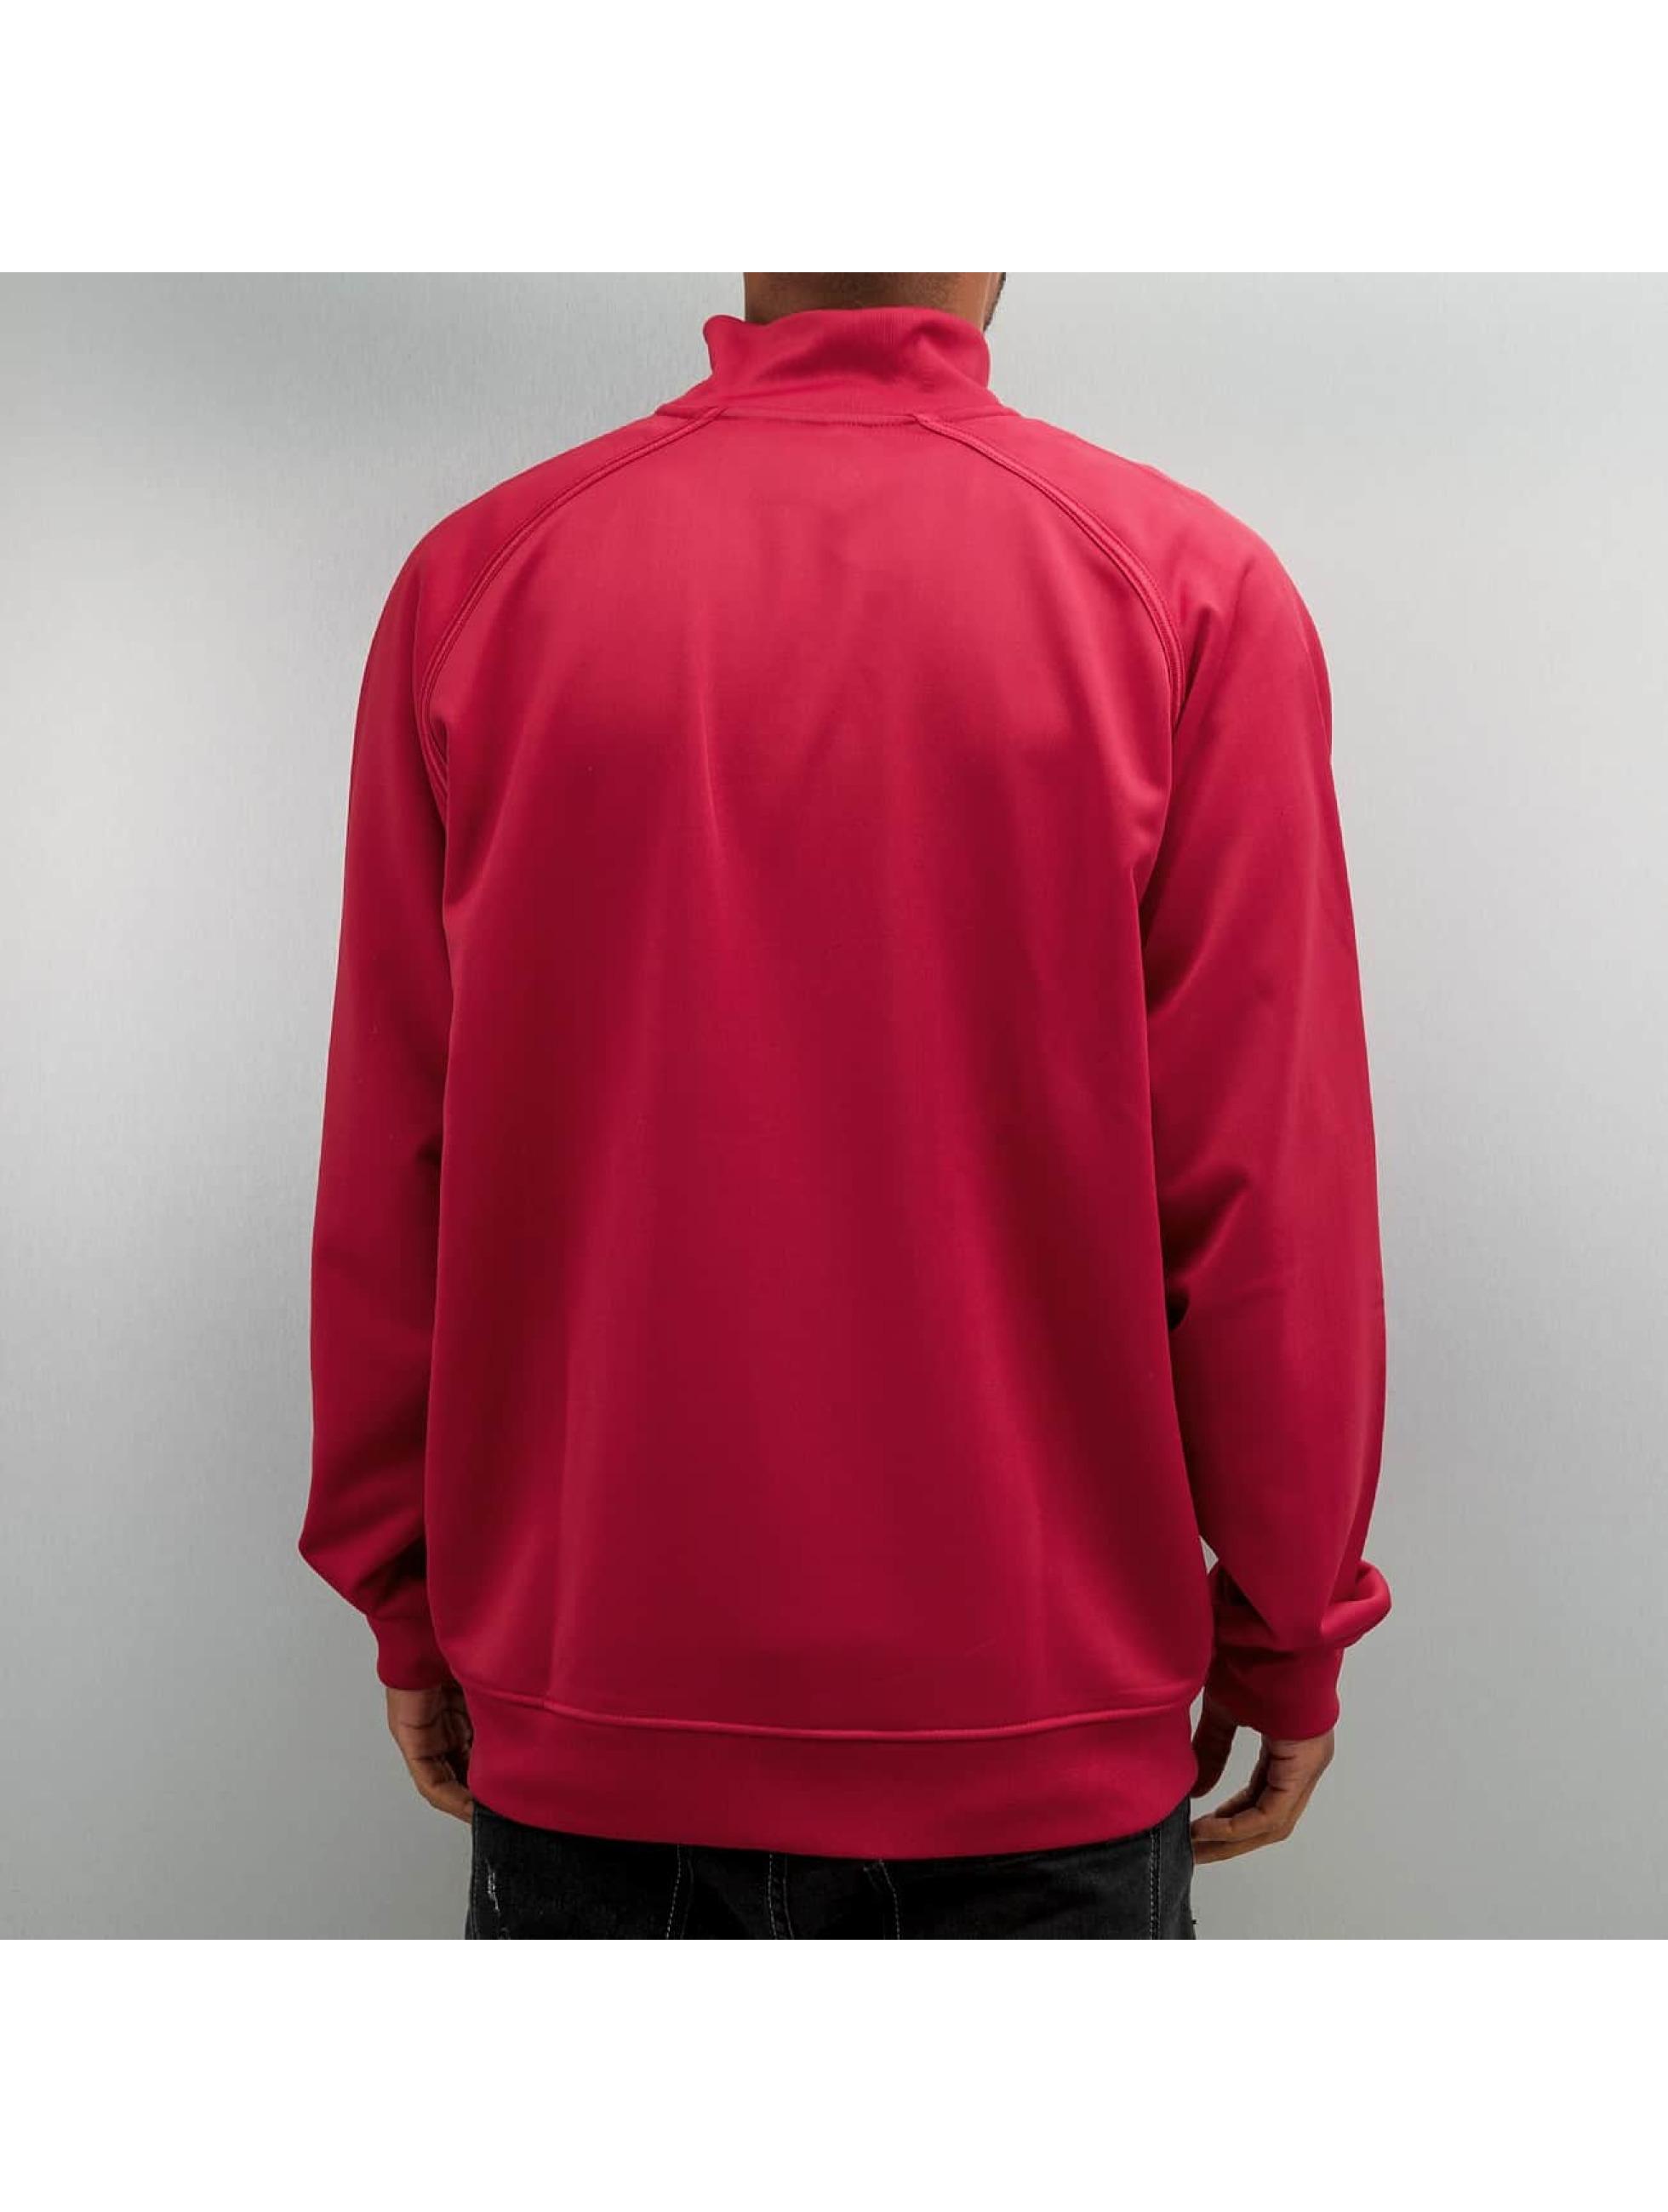 K1X Lightweight Jacket Hardwood Intimidator Warm Up red